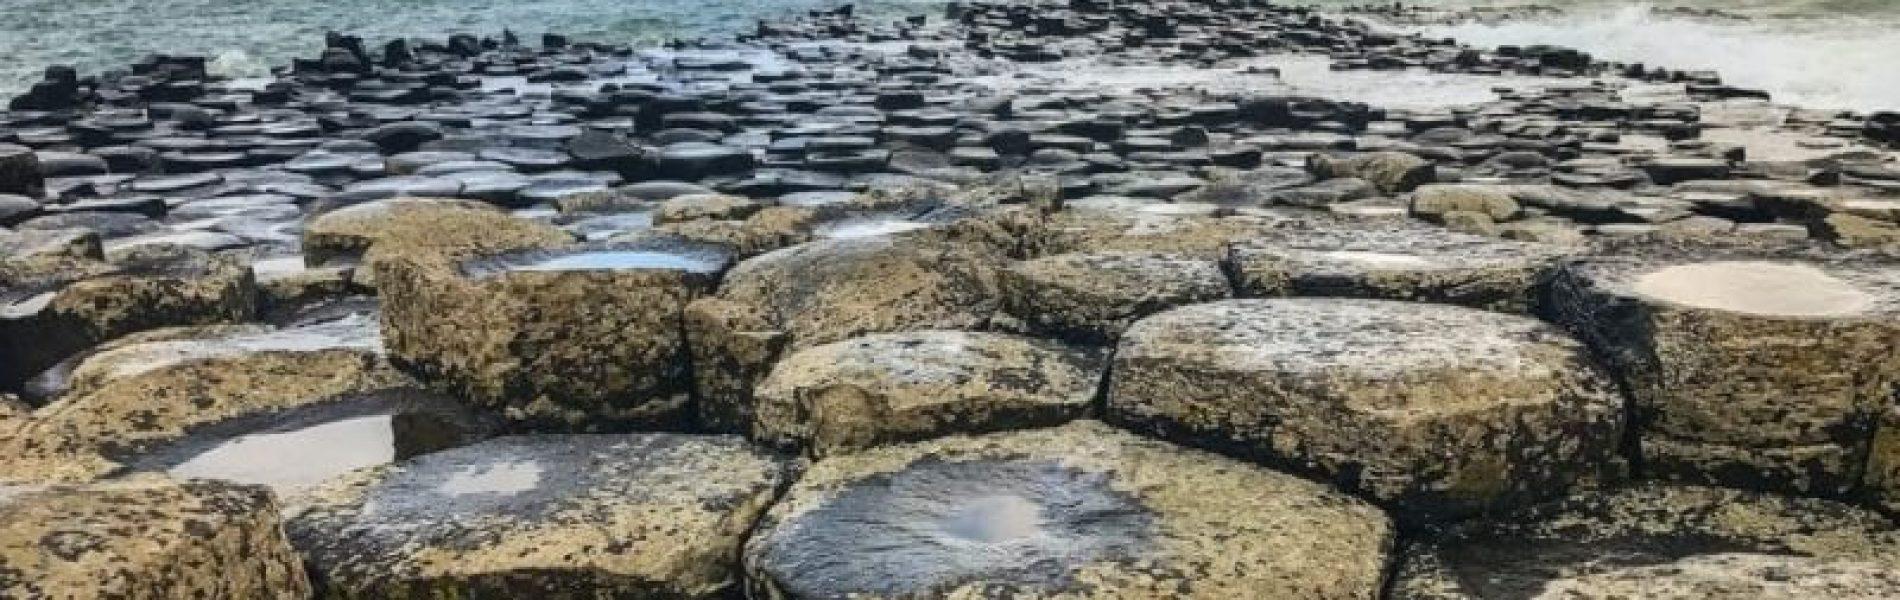 Ireland Travel Blog